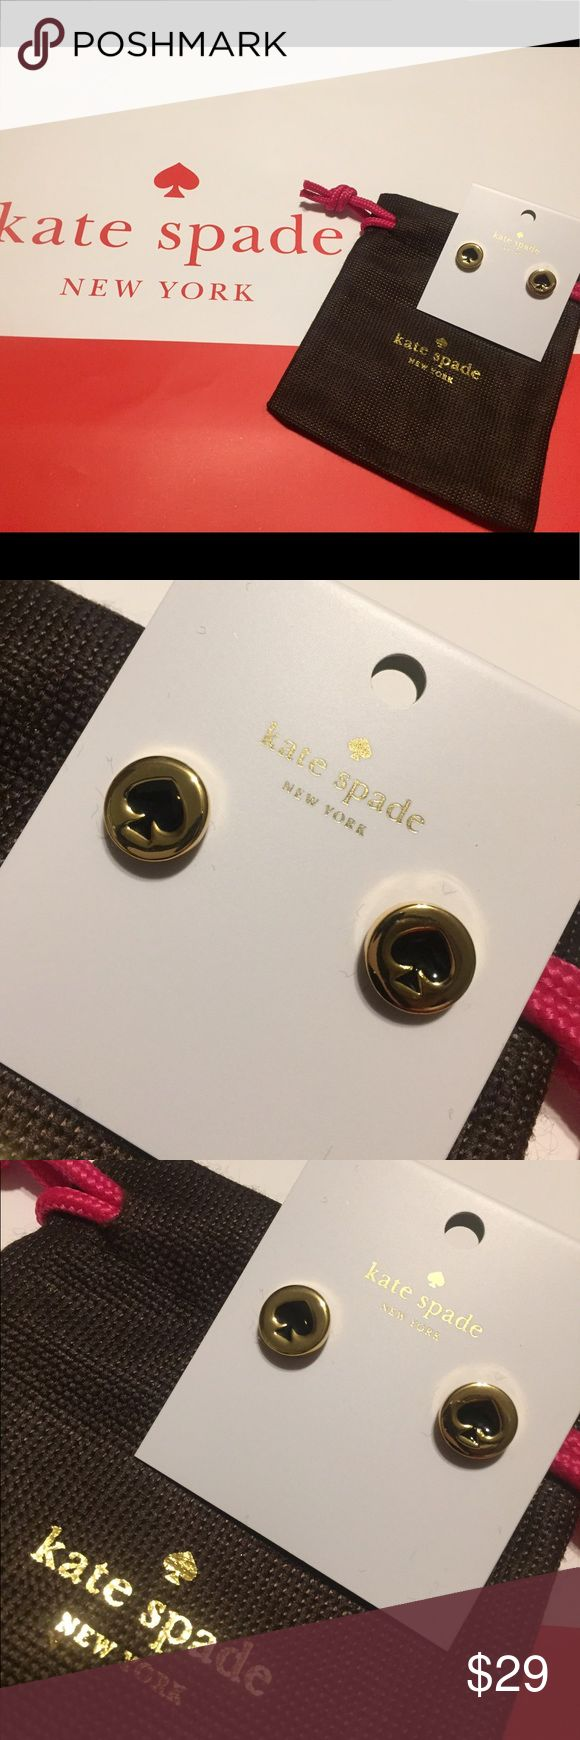 "♠️😍 KATE SPADE ""Spot the Spade"" Earrings in Gold Gorgeous Kate Spade earrings in gold with black Spade. Simple & Elegant. ♠️♠️♠️ Brand new with tags & dust bag 😉. kate spade Jewelry Earrings"